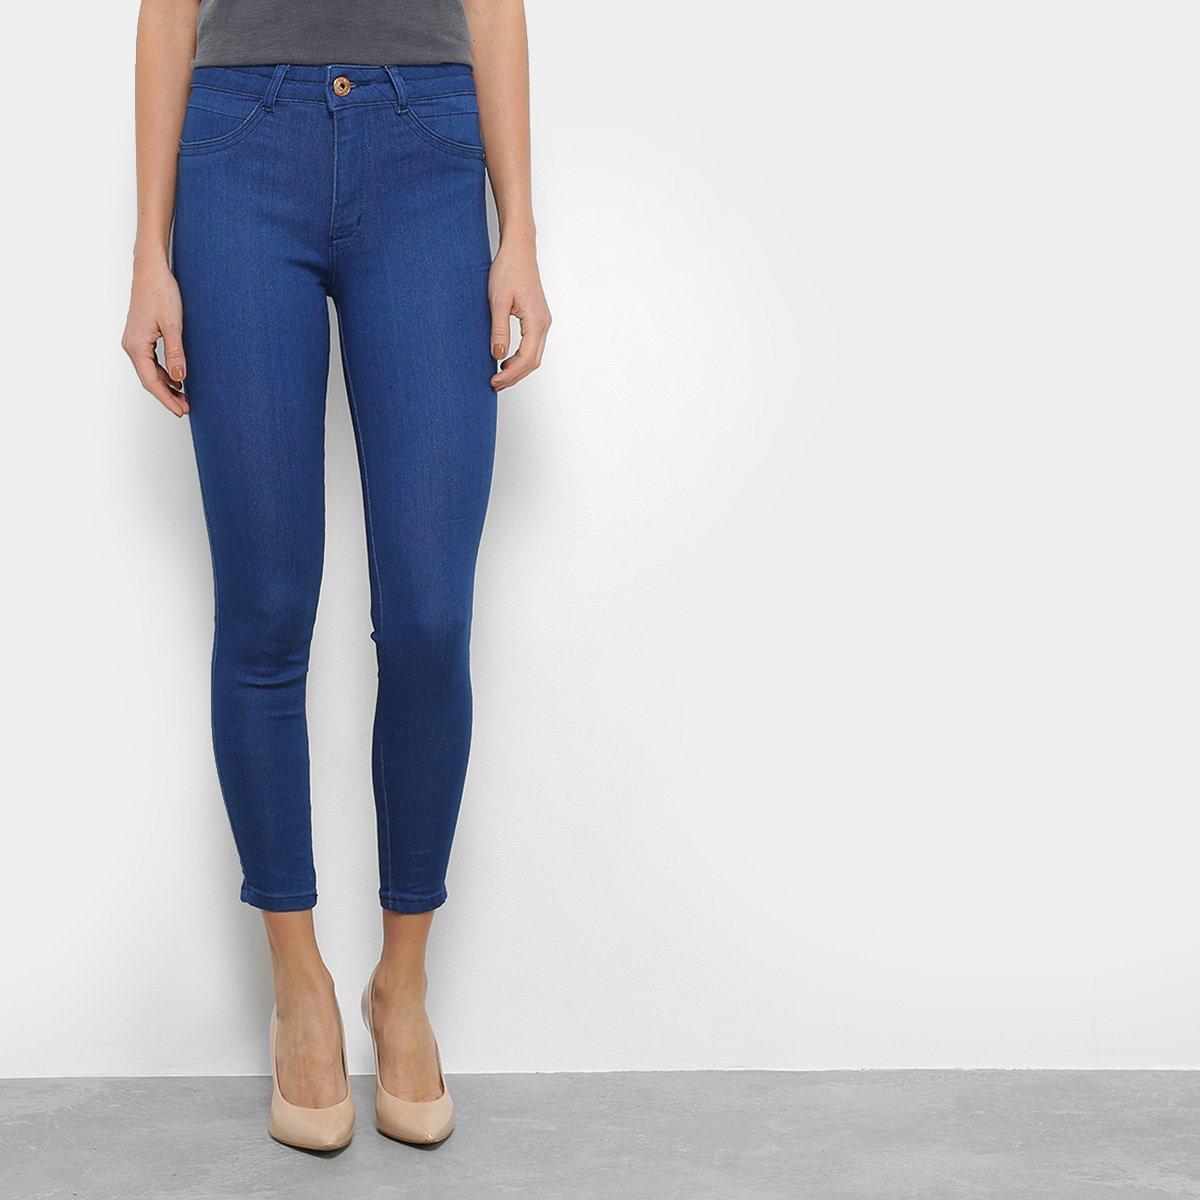 d7913c7f4 Calça Jeans Skinny Biotipo Jeans Cintura Média Feminina | Livelo ...